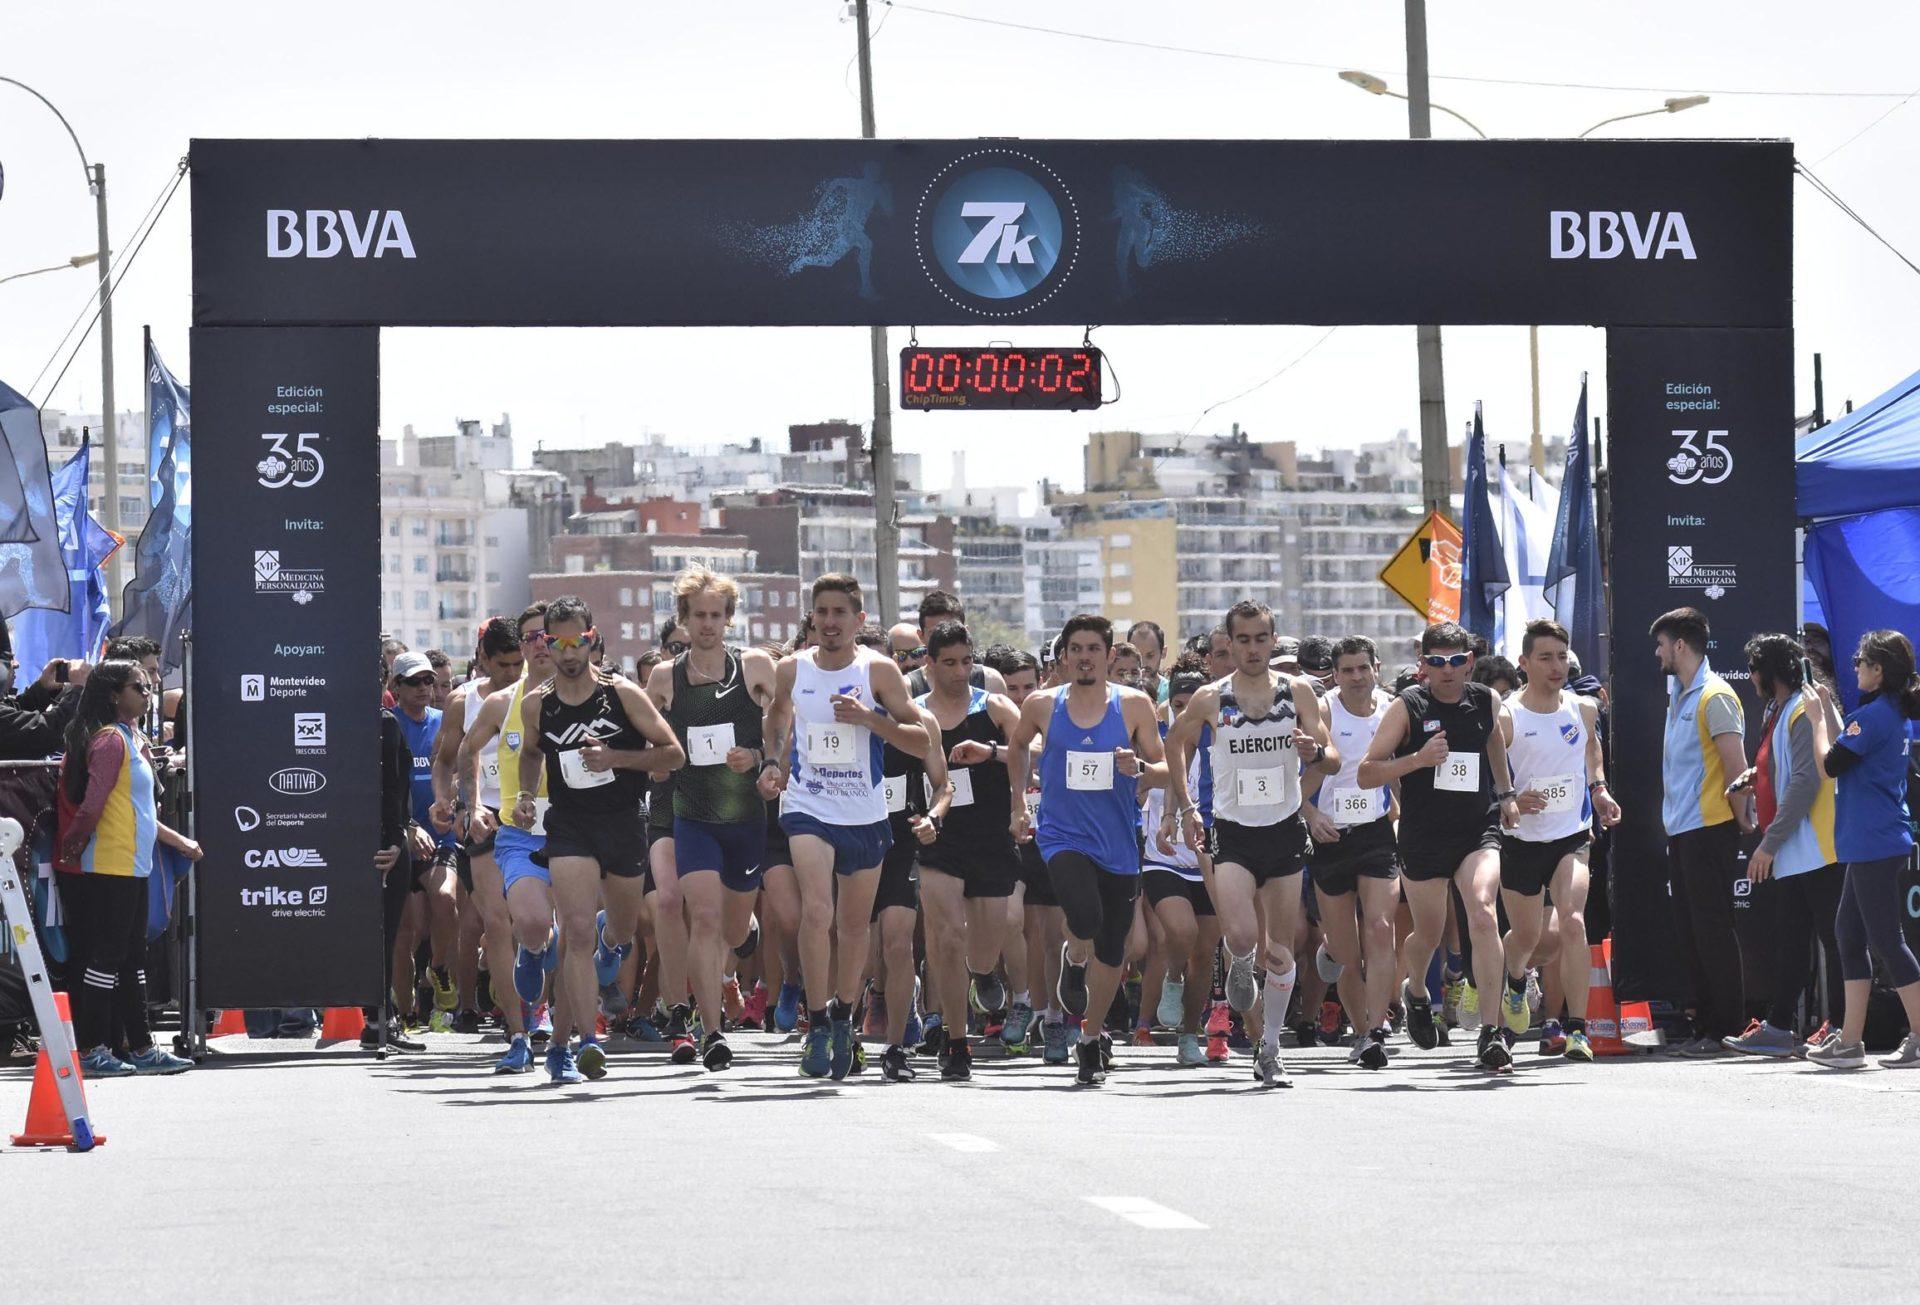 Carrera 7K BBVA Uruguay 2018